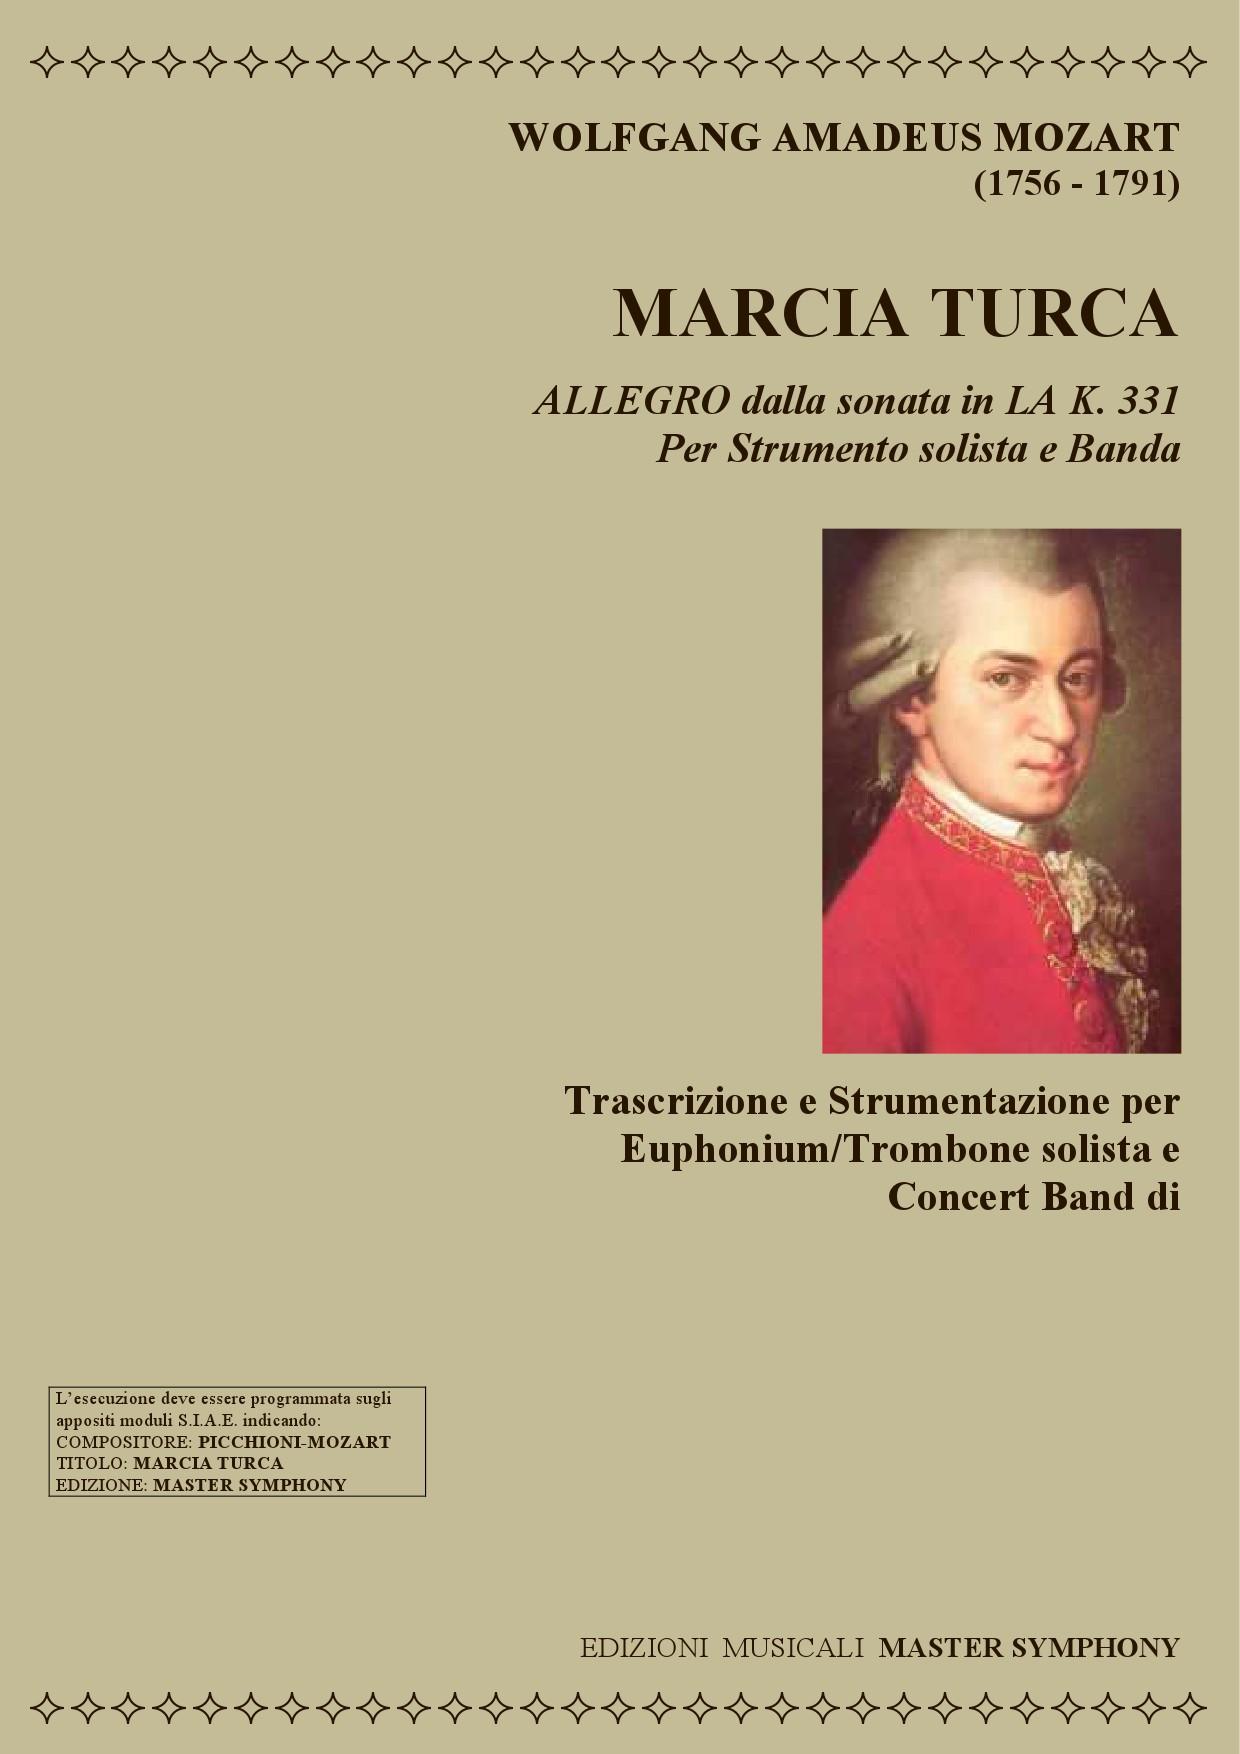 edizione musicale banda marcia